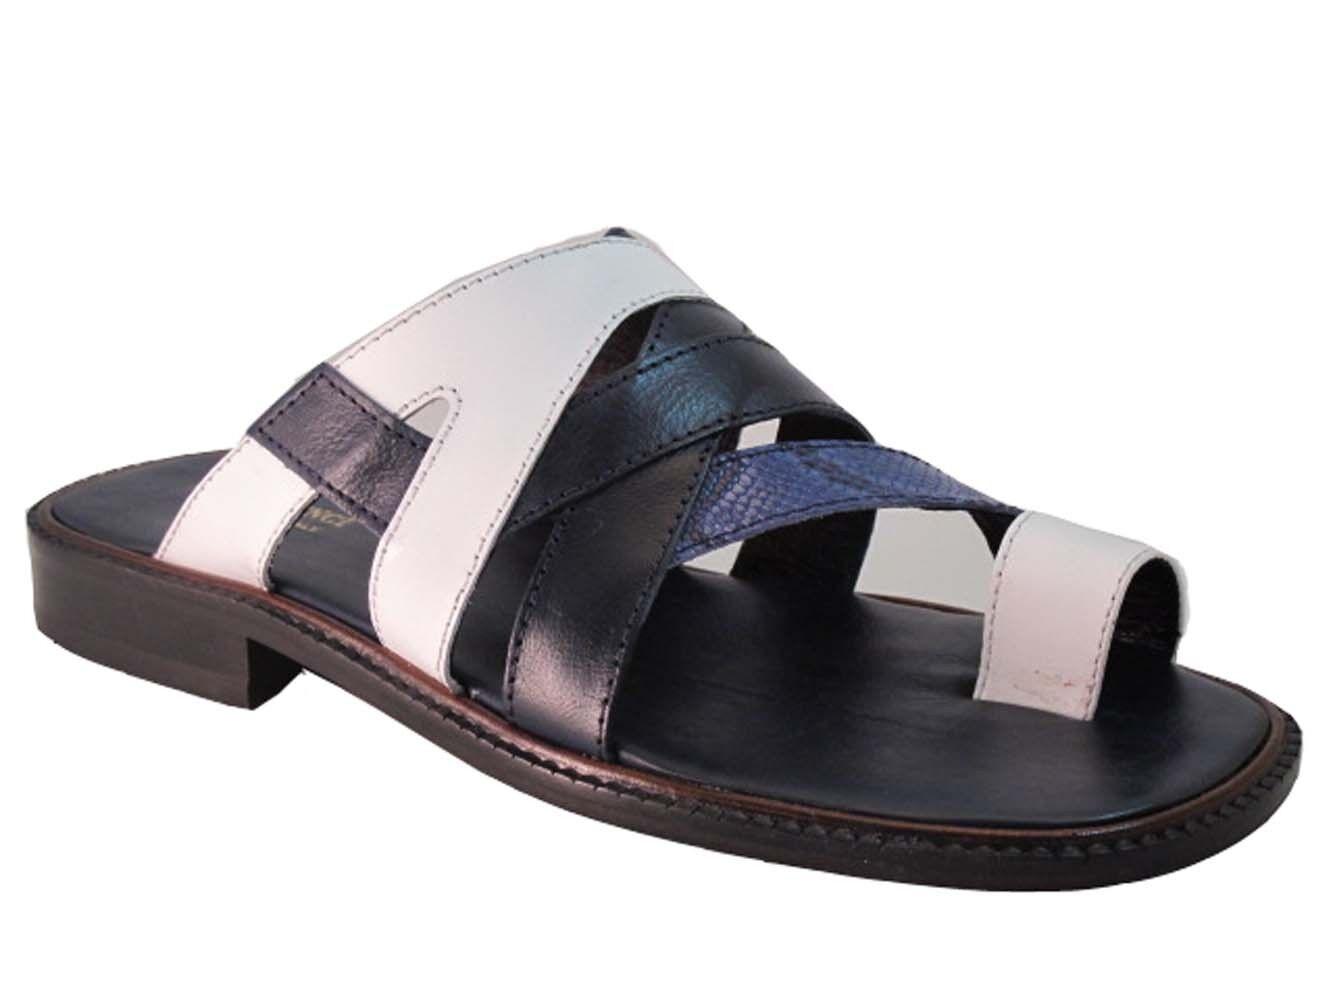 Davinci 3839 Men's Push In Toe Italian leather Sandals, White bluee